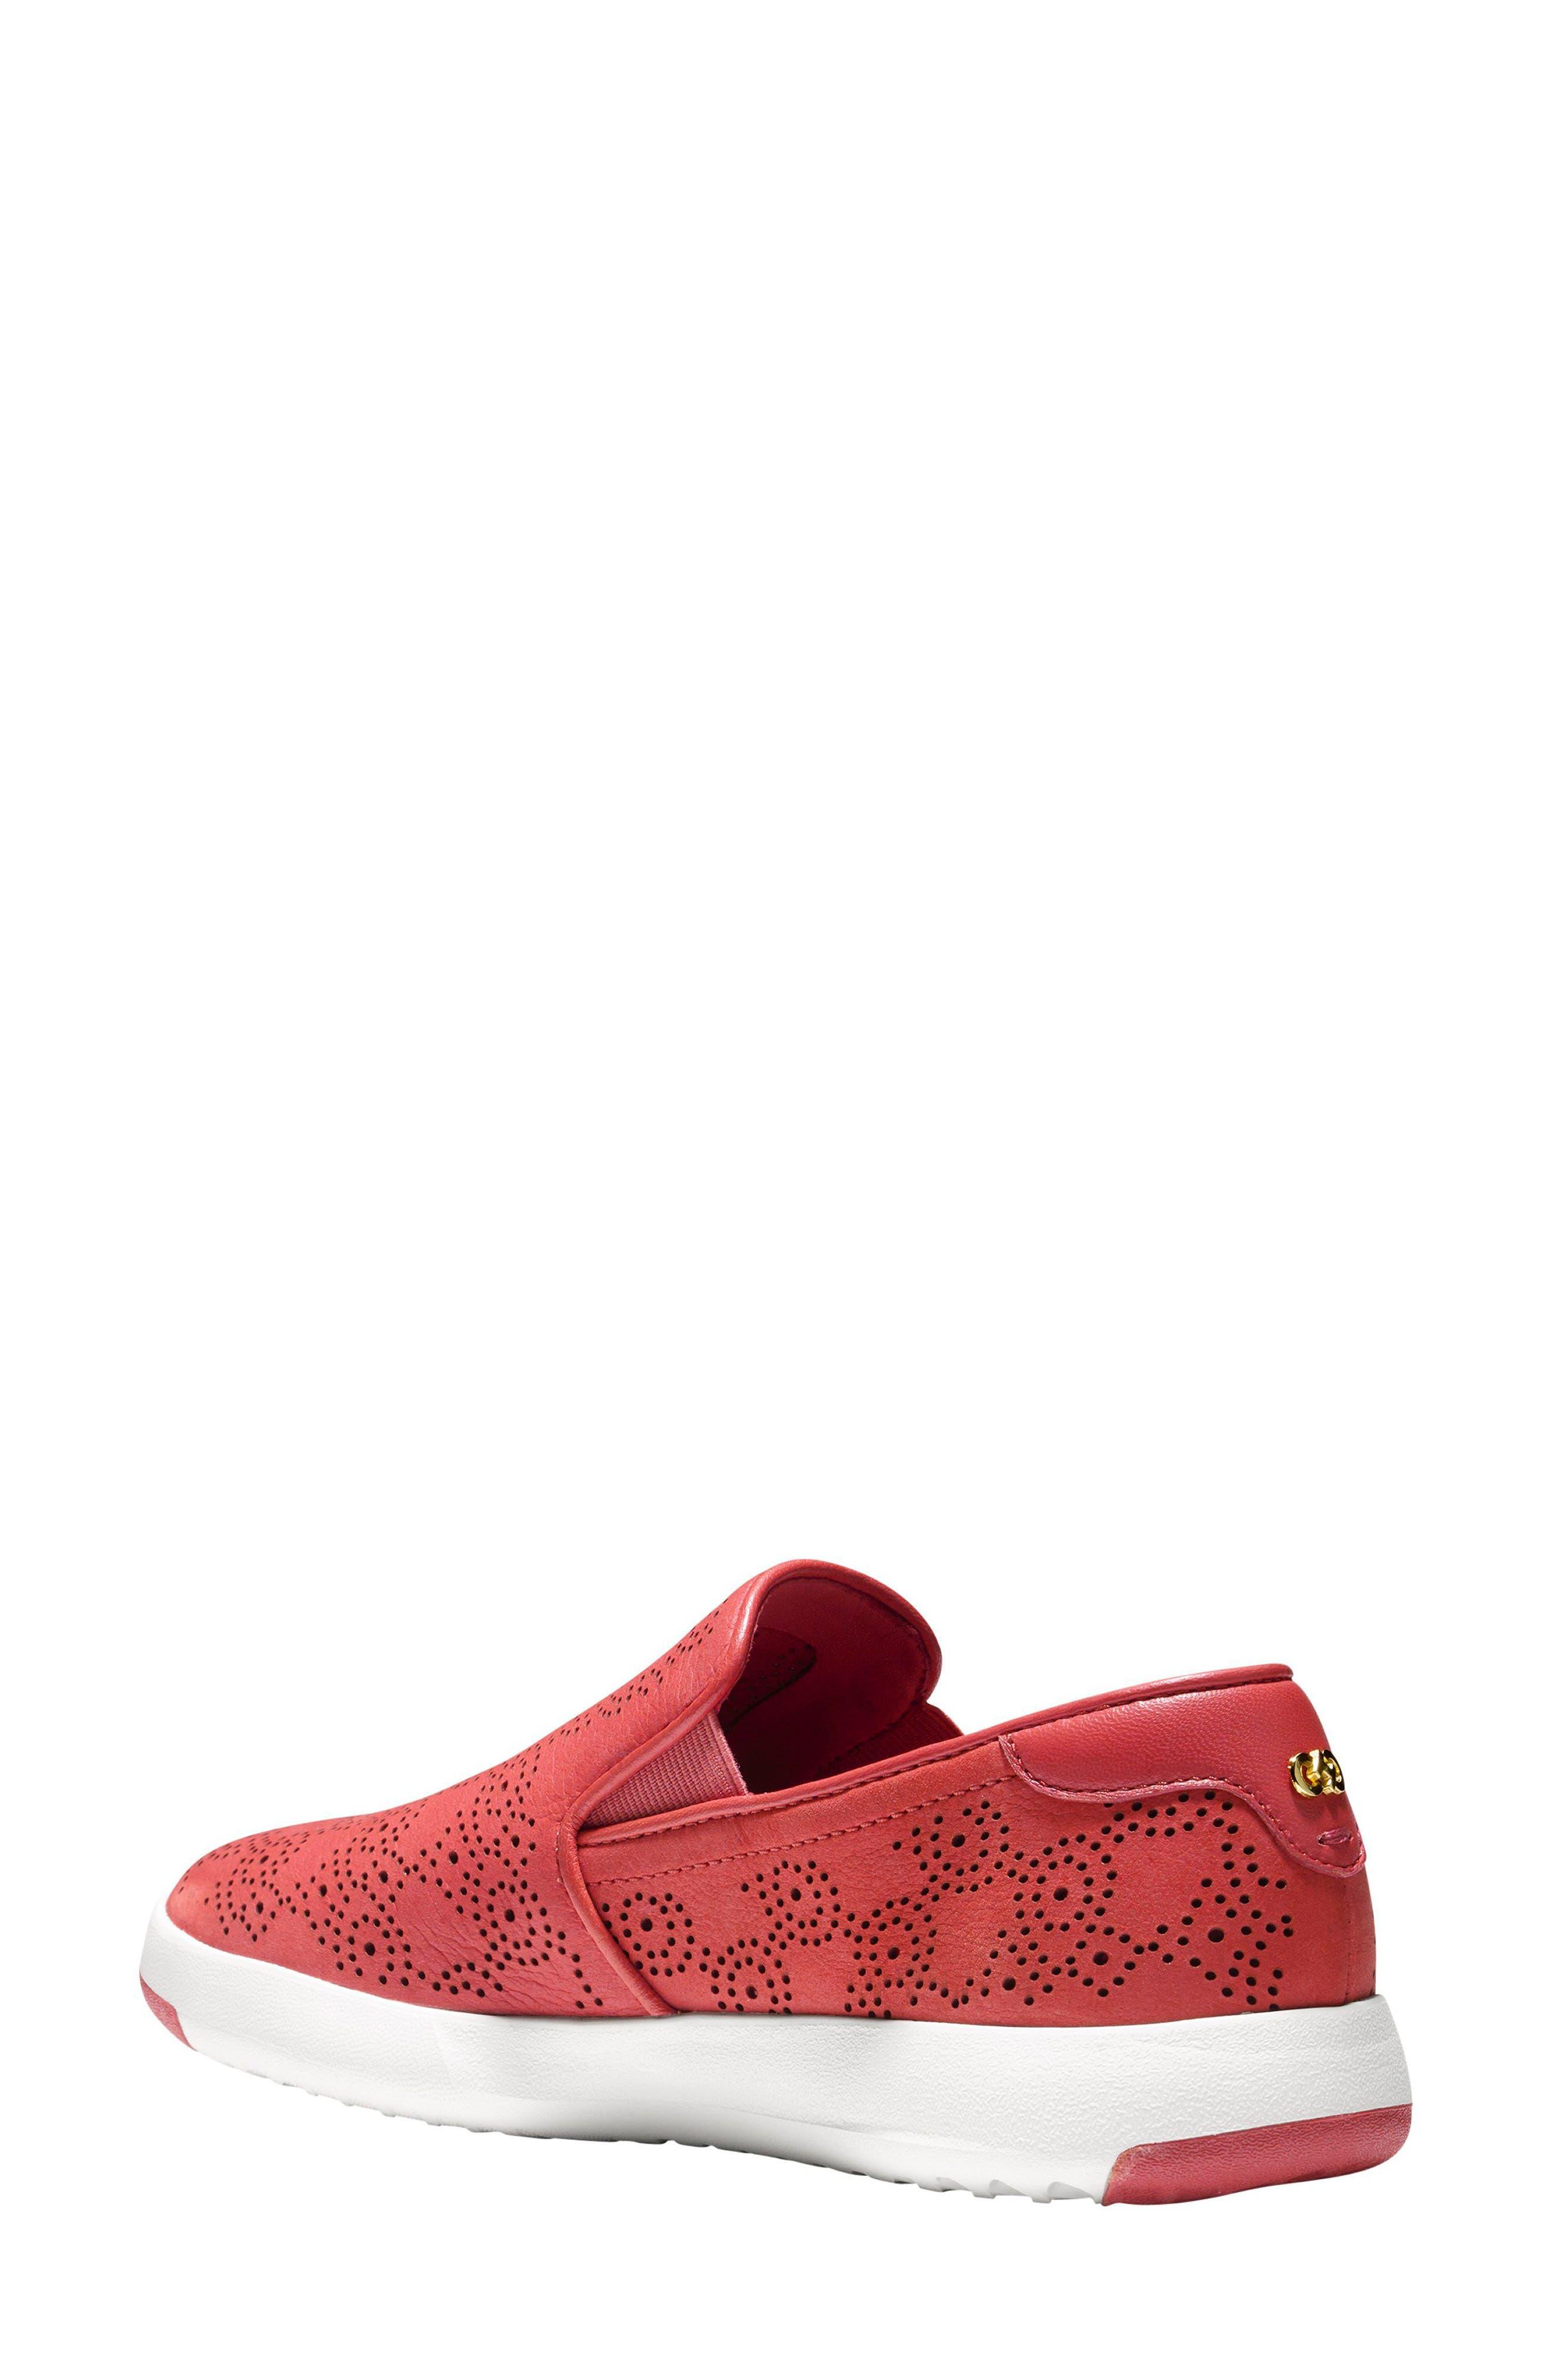 GrandPro Perforated Slip-On Sneaker,                             Alternate thumbnail 4, color,